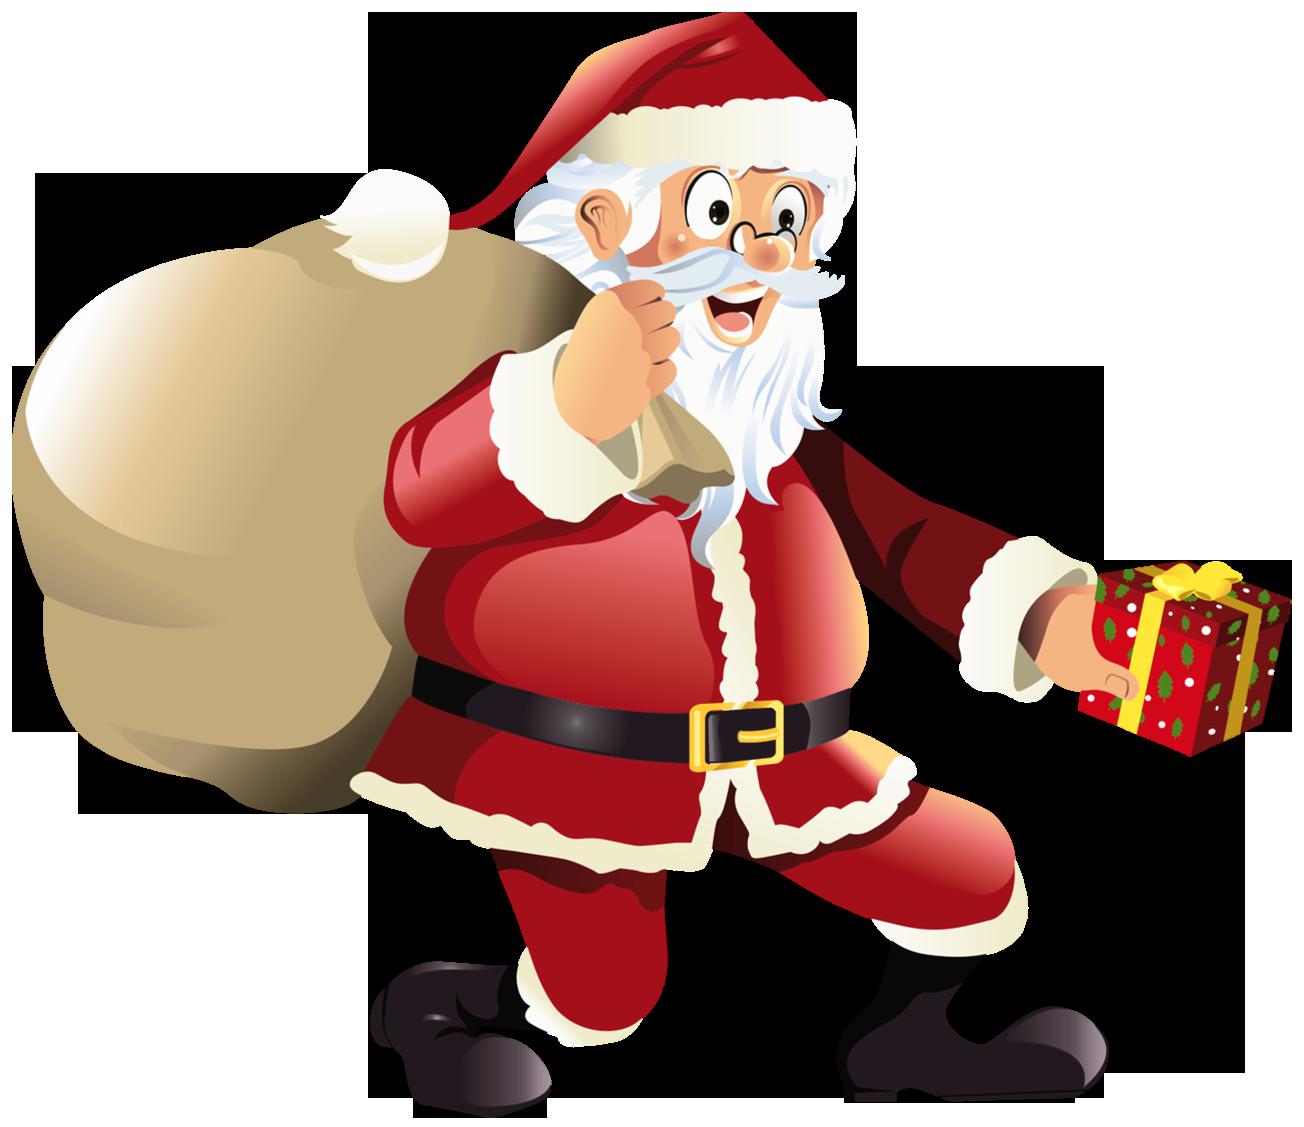 Santa Claus Png Image Santa Claus Christmas Artwork Santa Claus Images